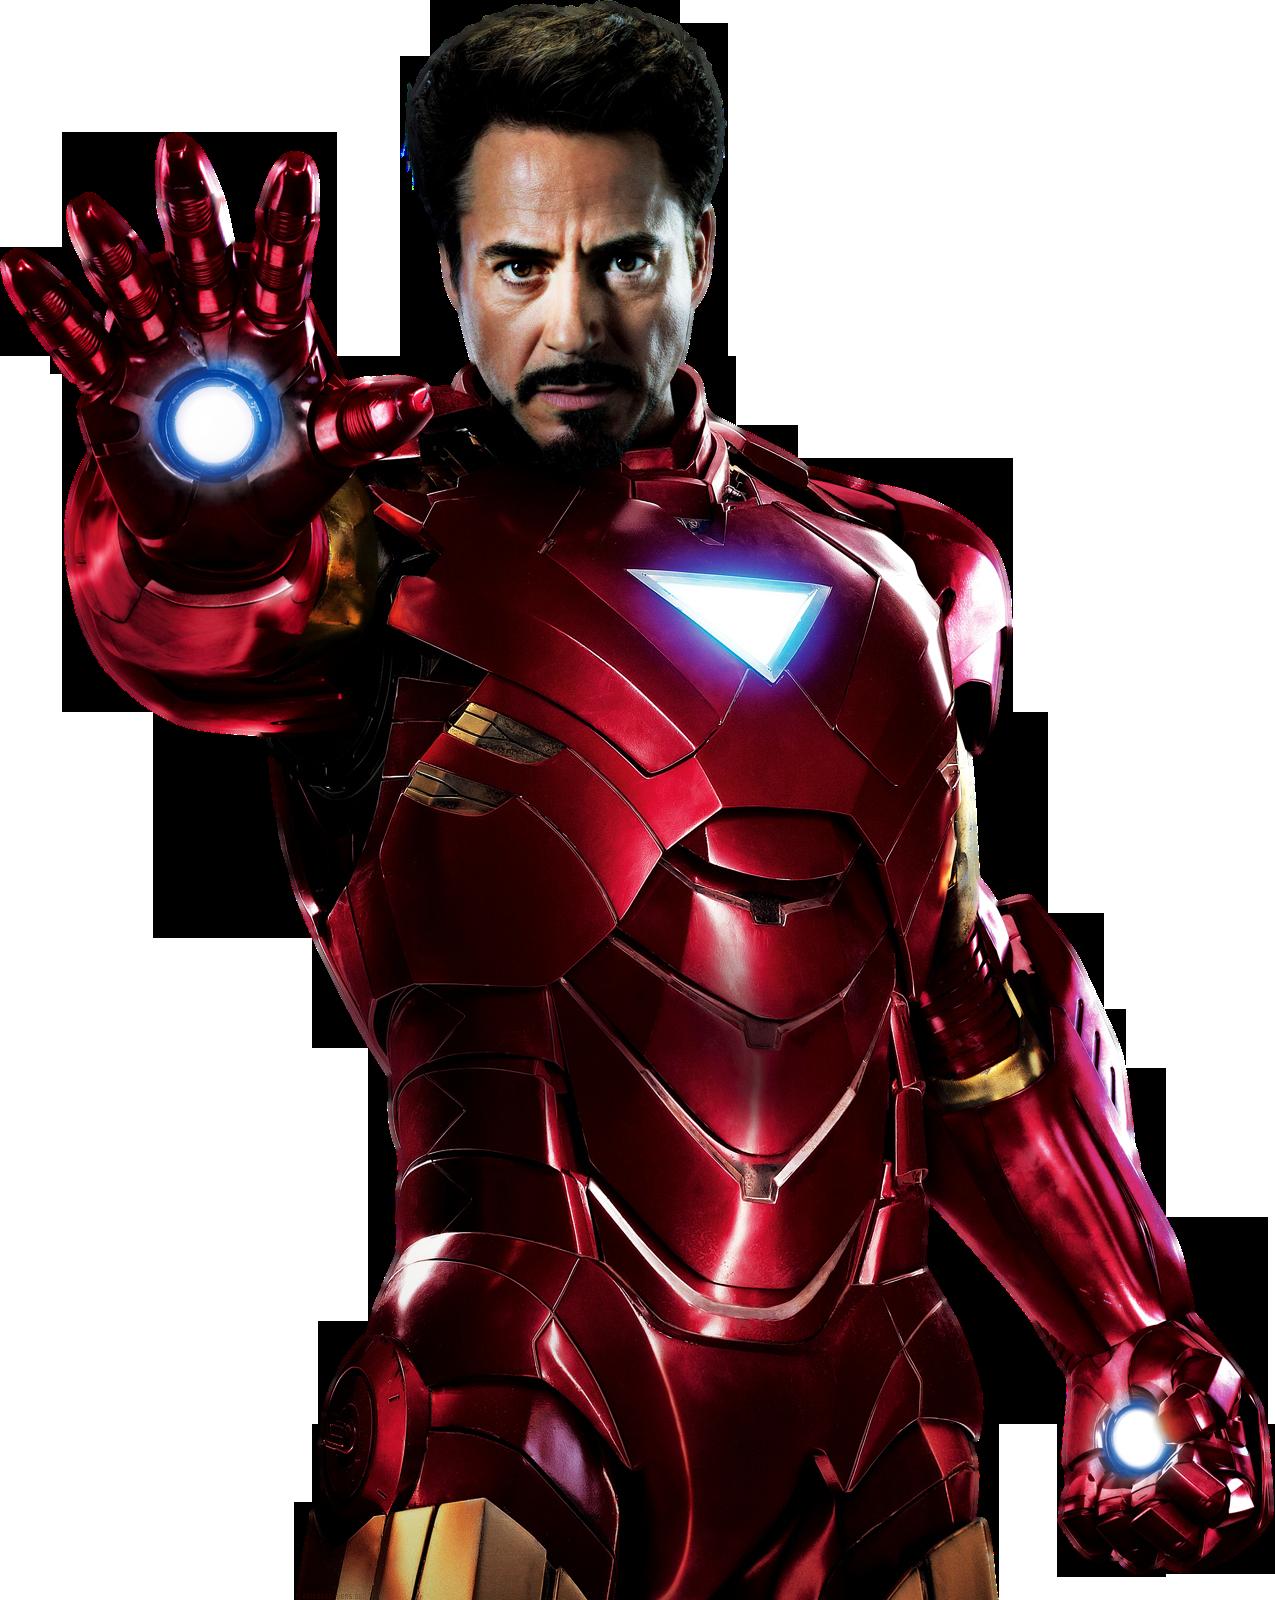 Download Iron Man HQ PNG Image | FreePNGImg